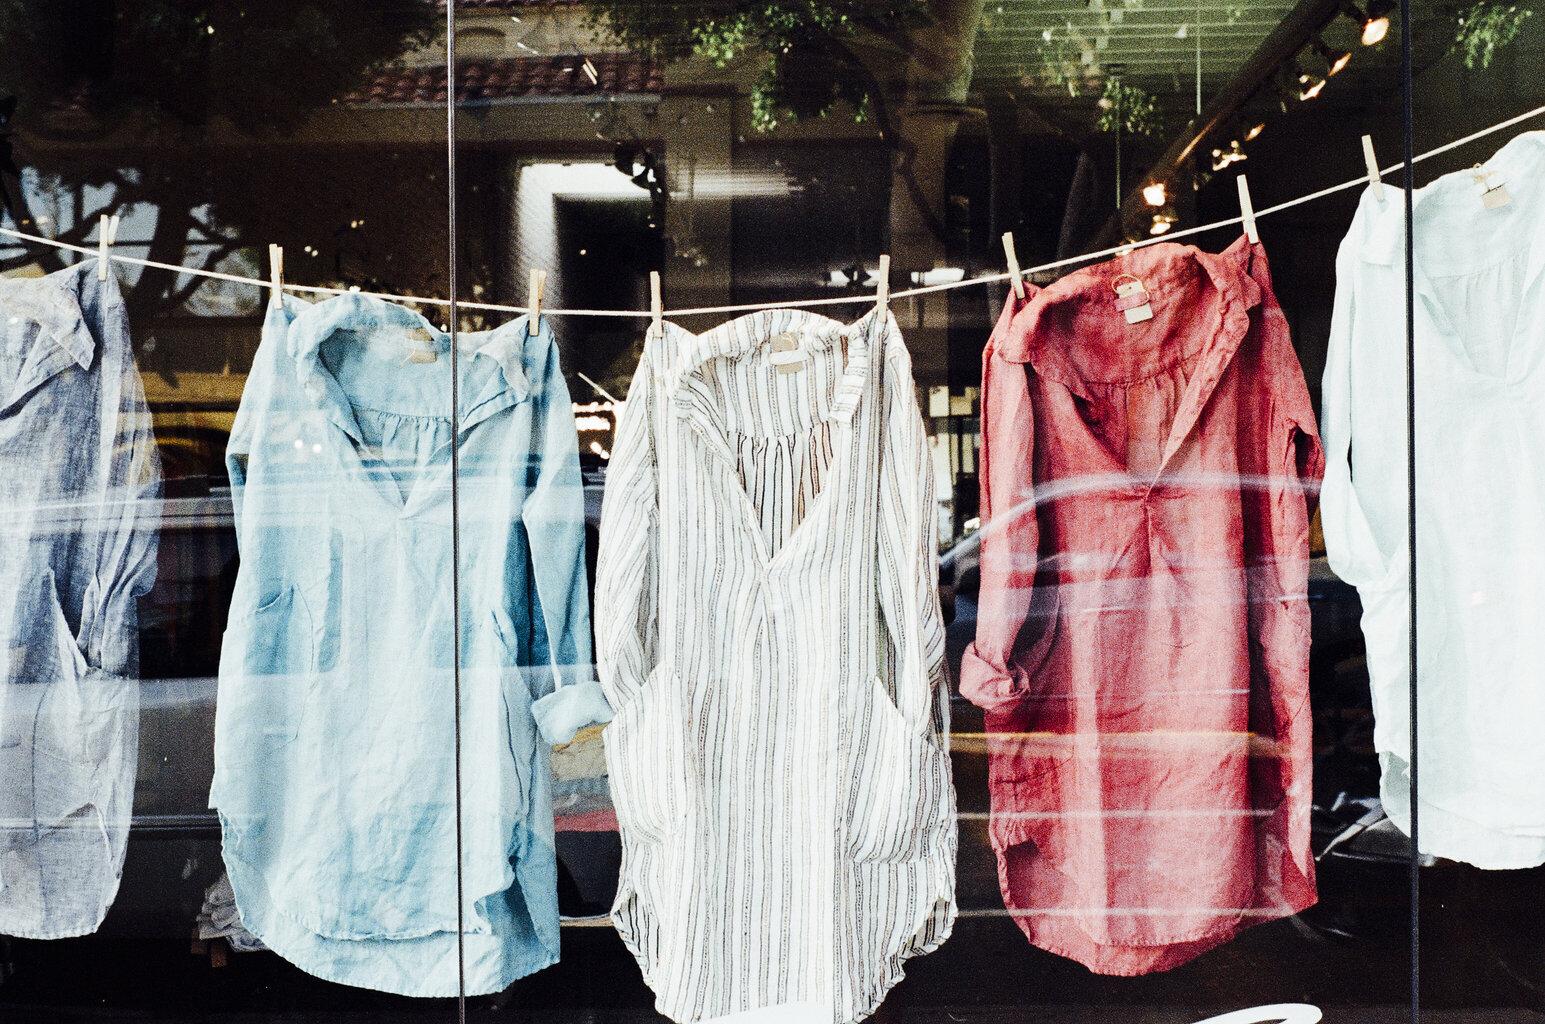 Page365-เปิดร้านขายอะไรดี-เปิดร้านขายเสื้อผ้า.jpg